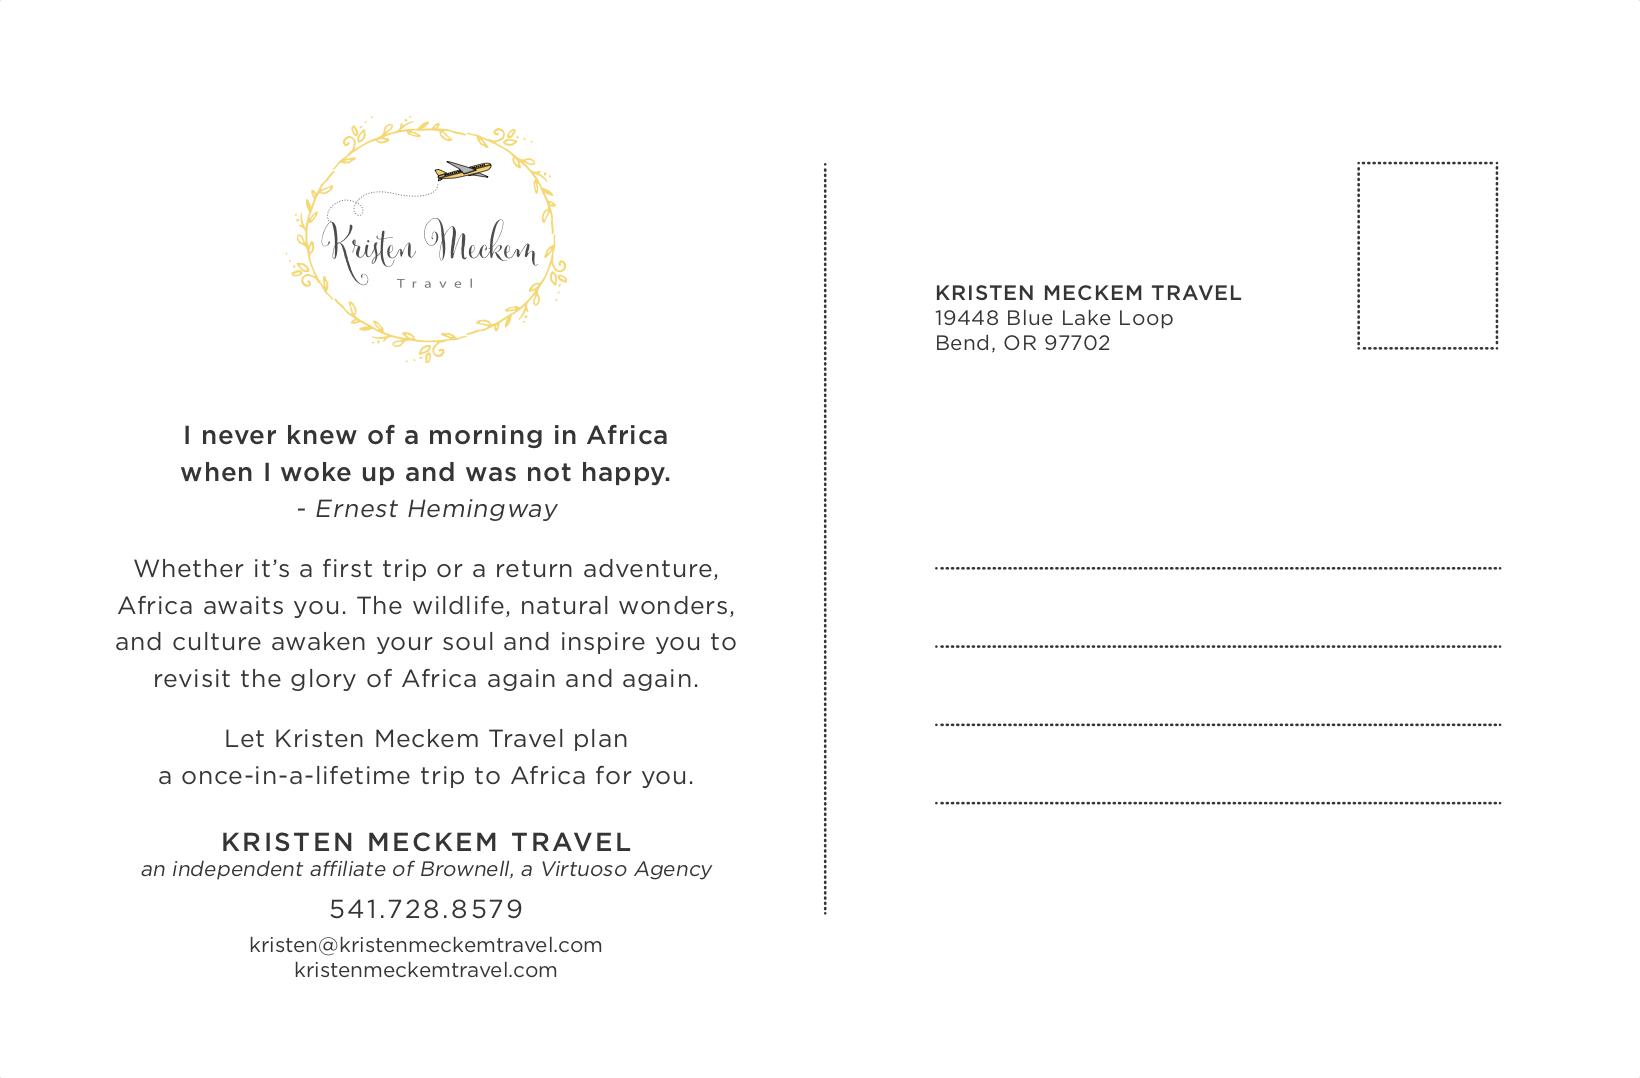 Africa Awaits Postcard back